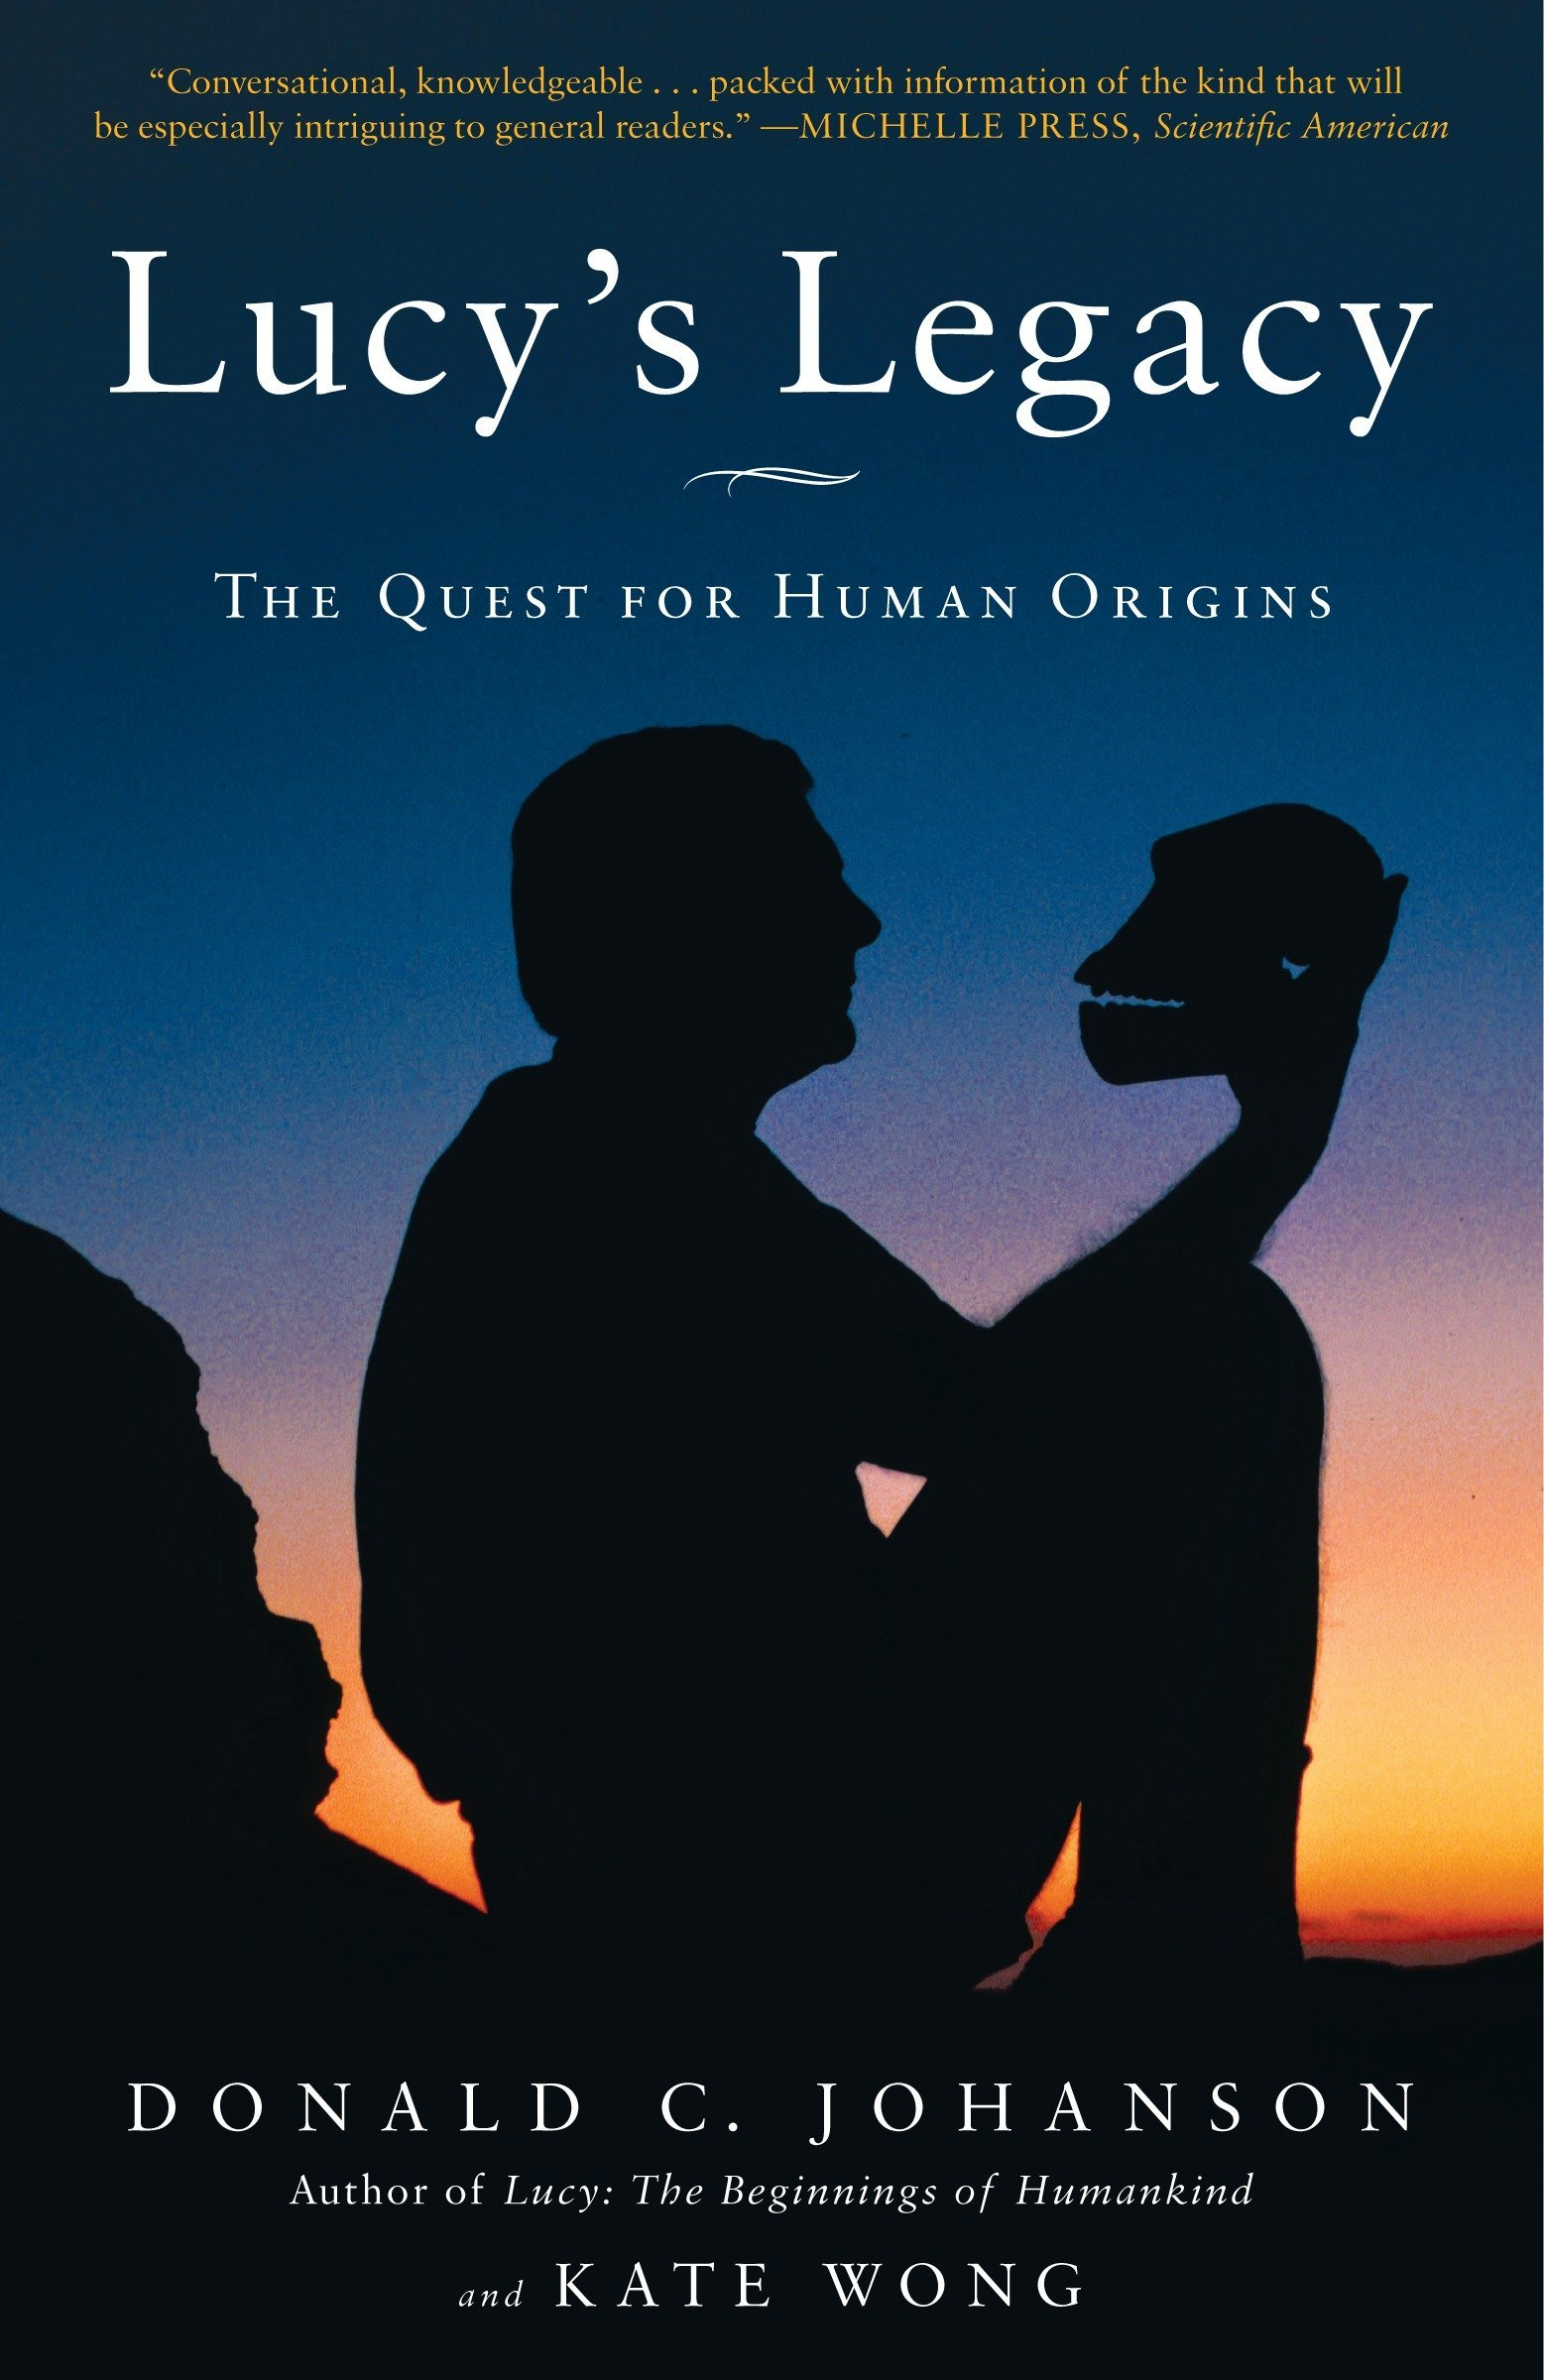 Lucy's Legacy: The Quest for Human Origins: Dr. Donald Johanson, Kate Wong:  9780307396402: Amazon.com: Books